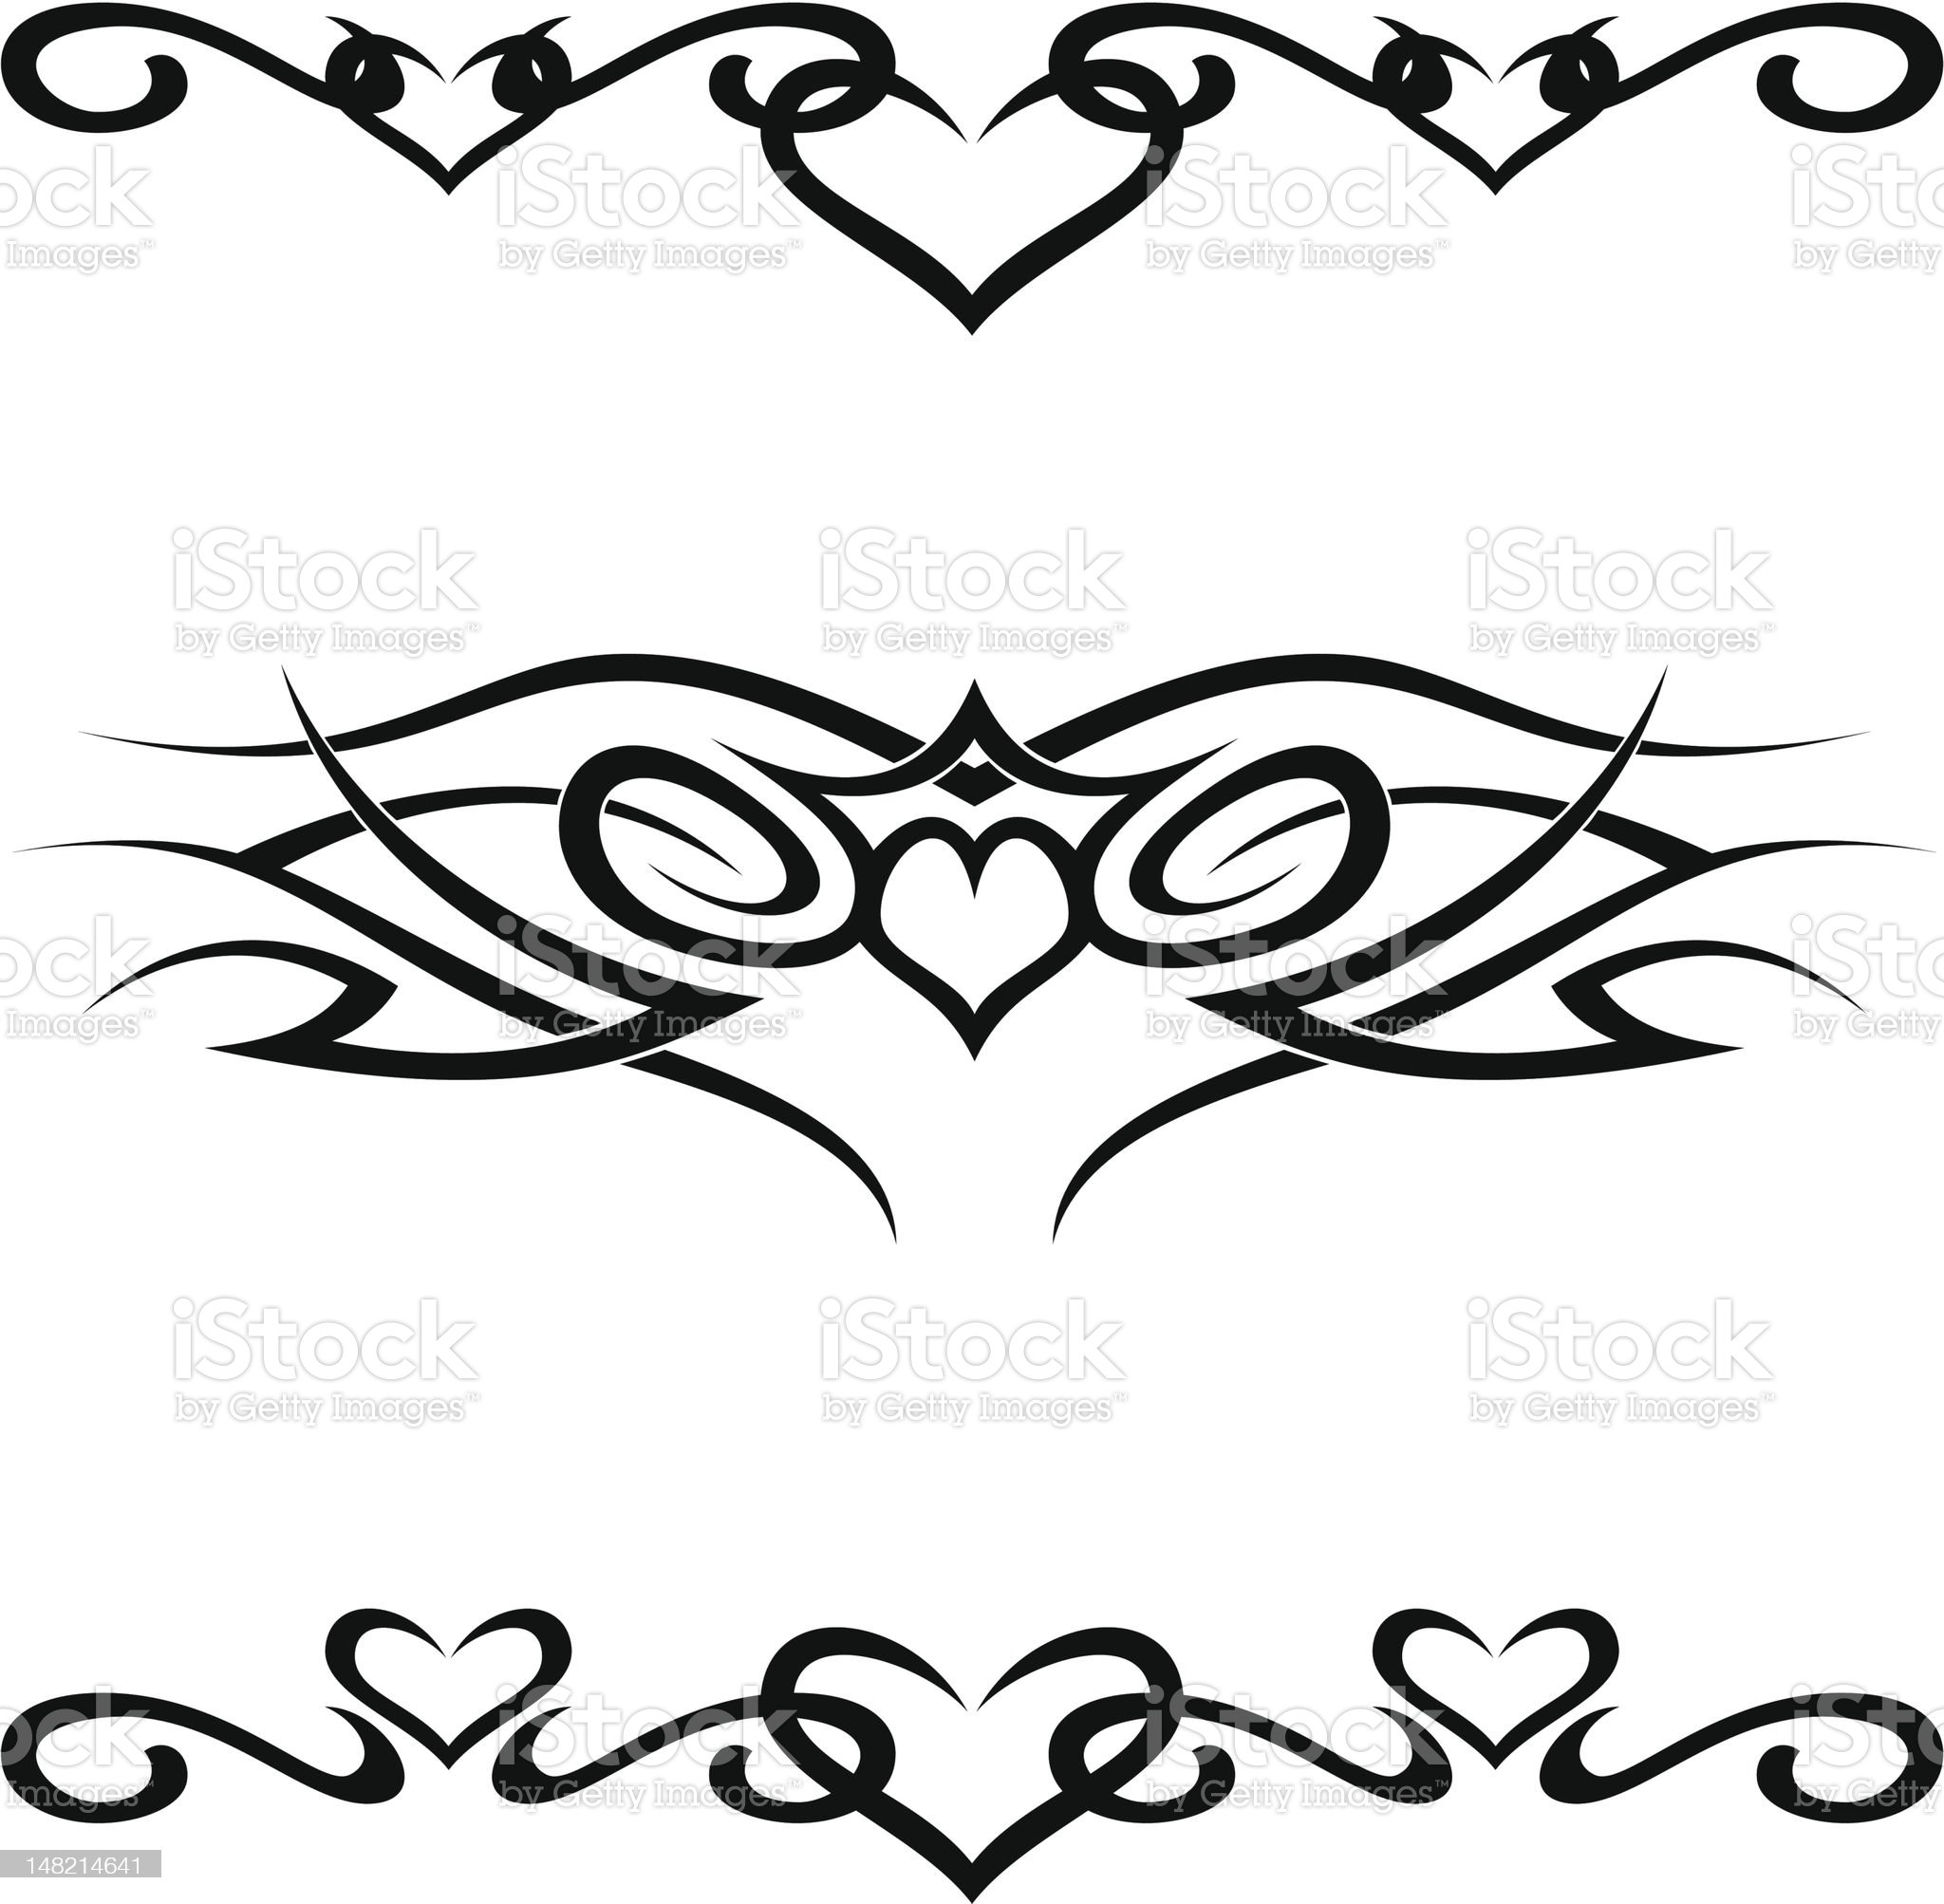 tribal tattoos royalty-free stock vector art